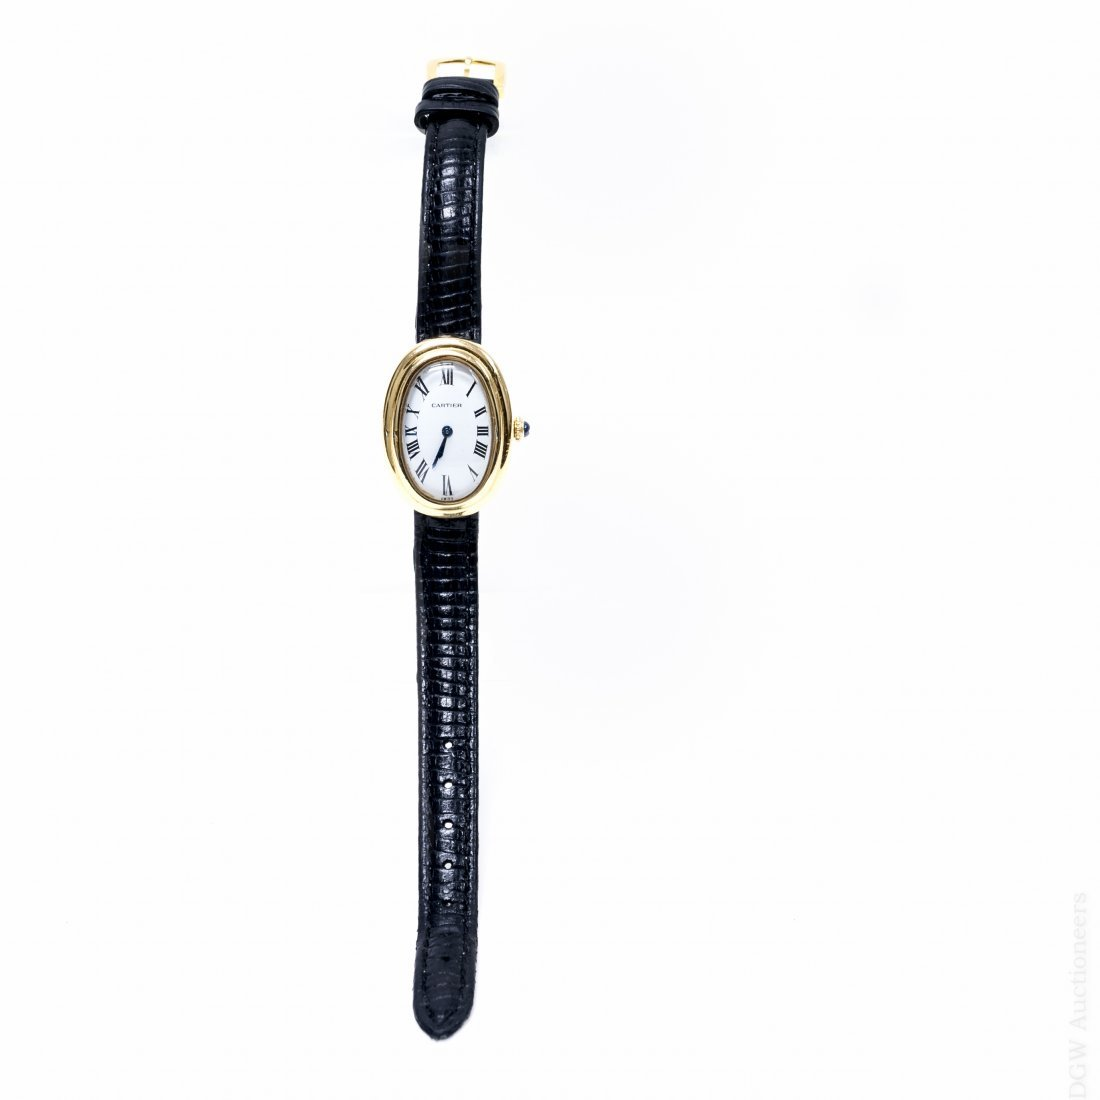 Cartier Baignoire 18K Yellow Gold Watch.